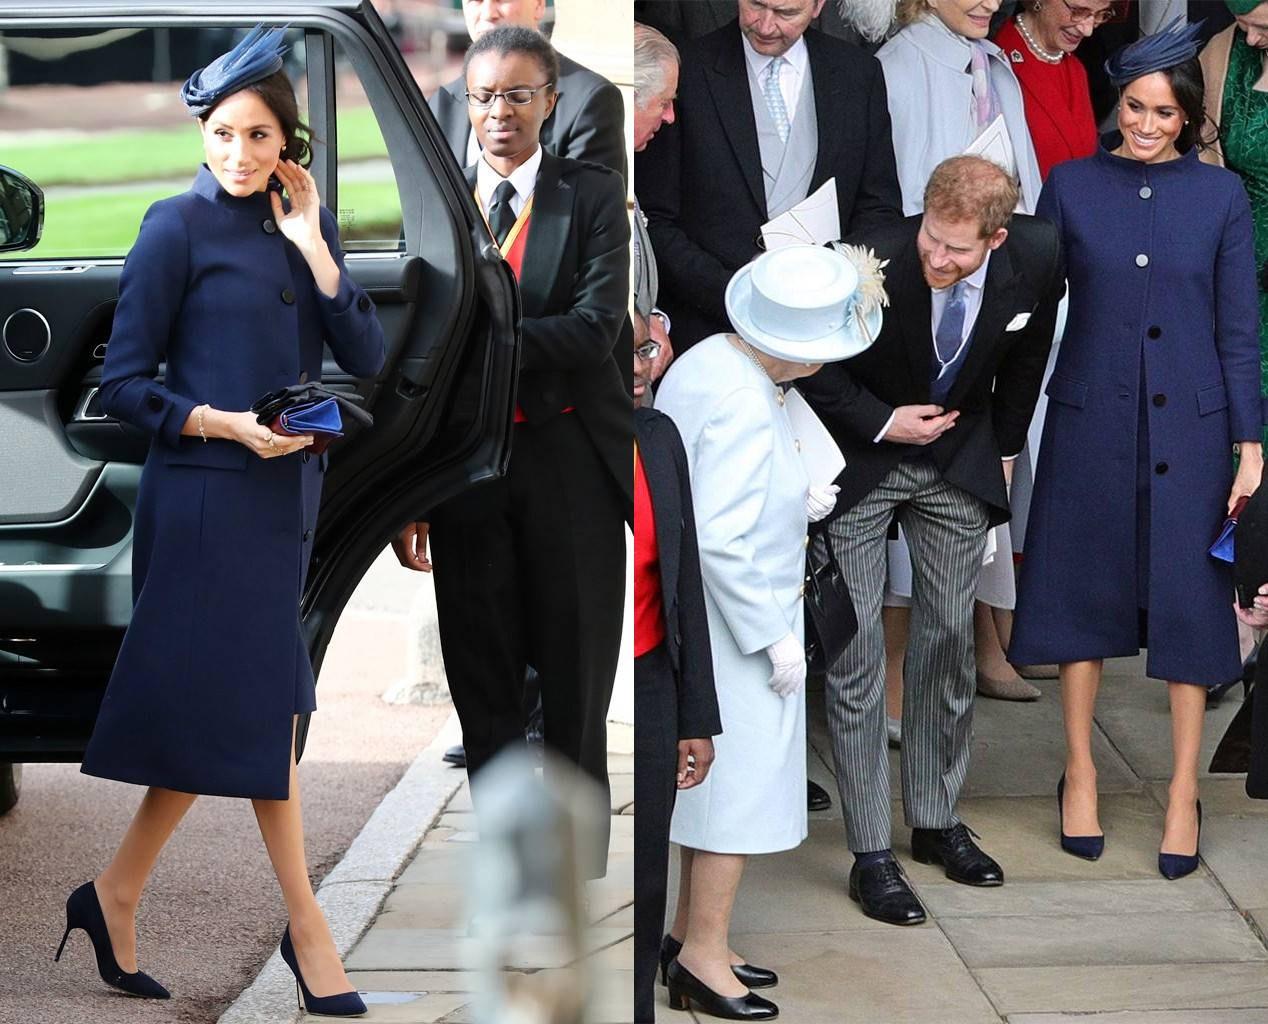 Meghan Markle in Princess Eugenie Royal Wedding